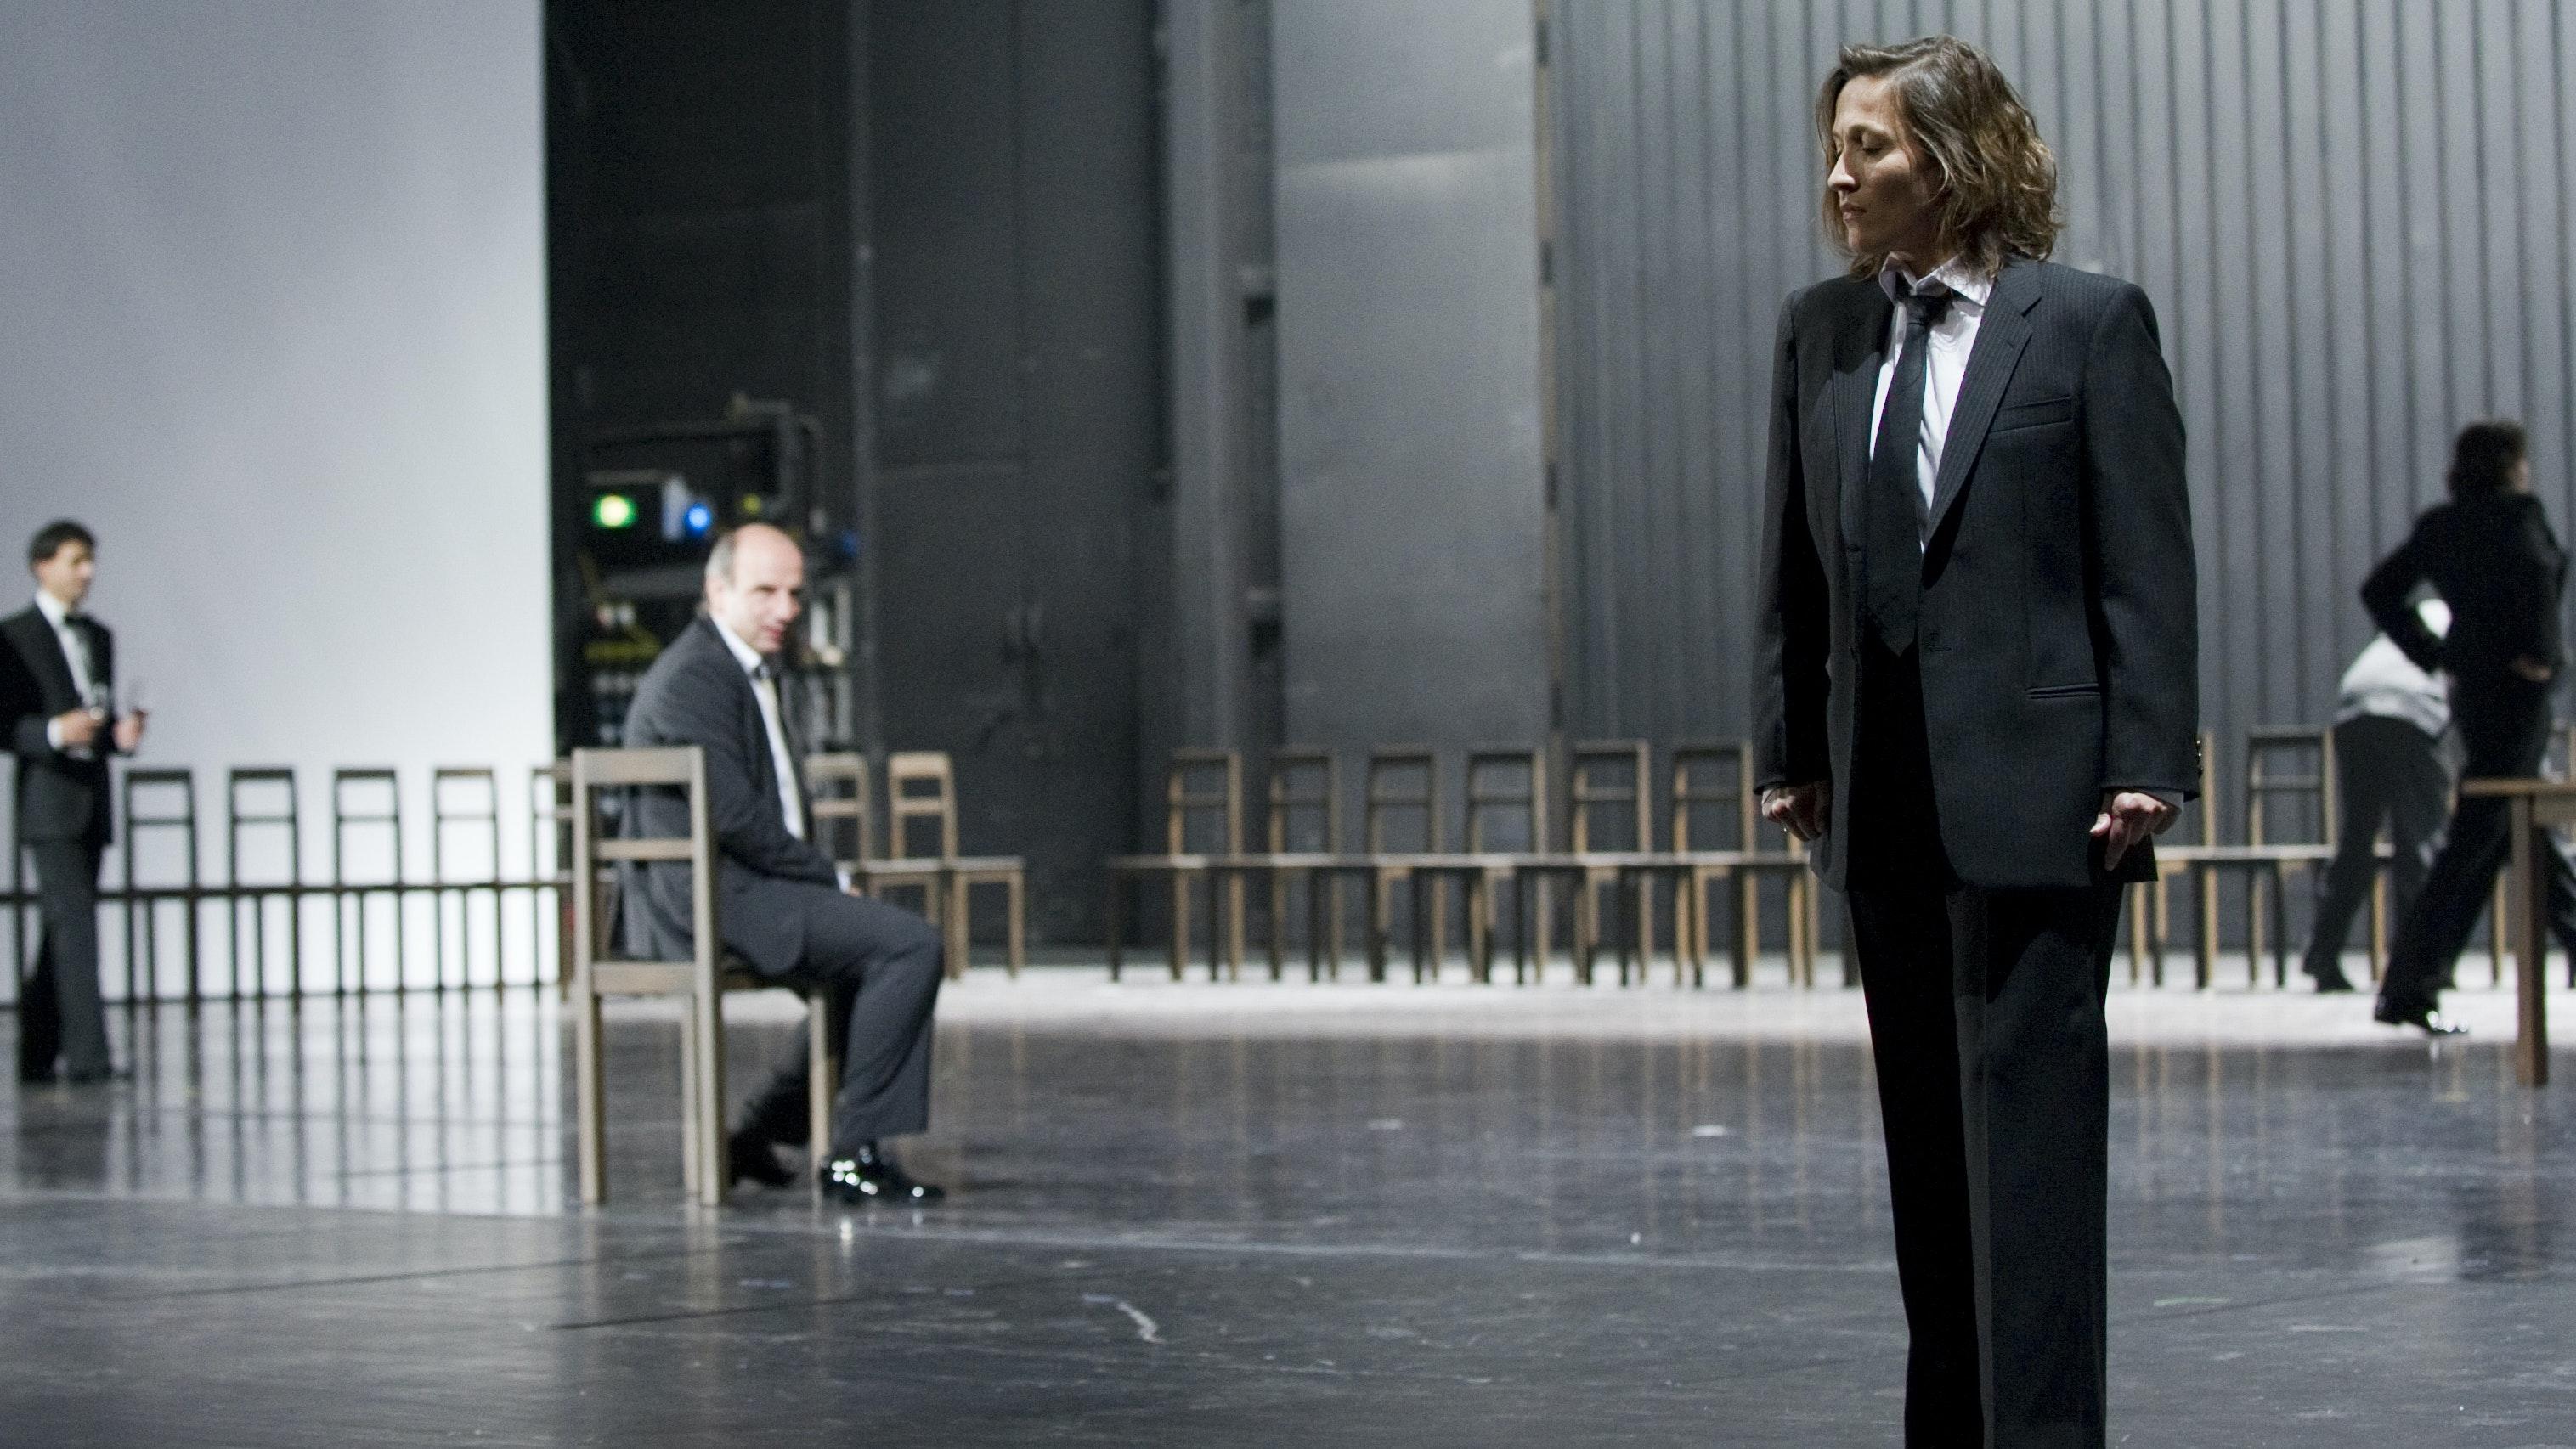 Verdi's The Sicilian Vespers